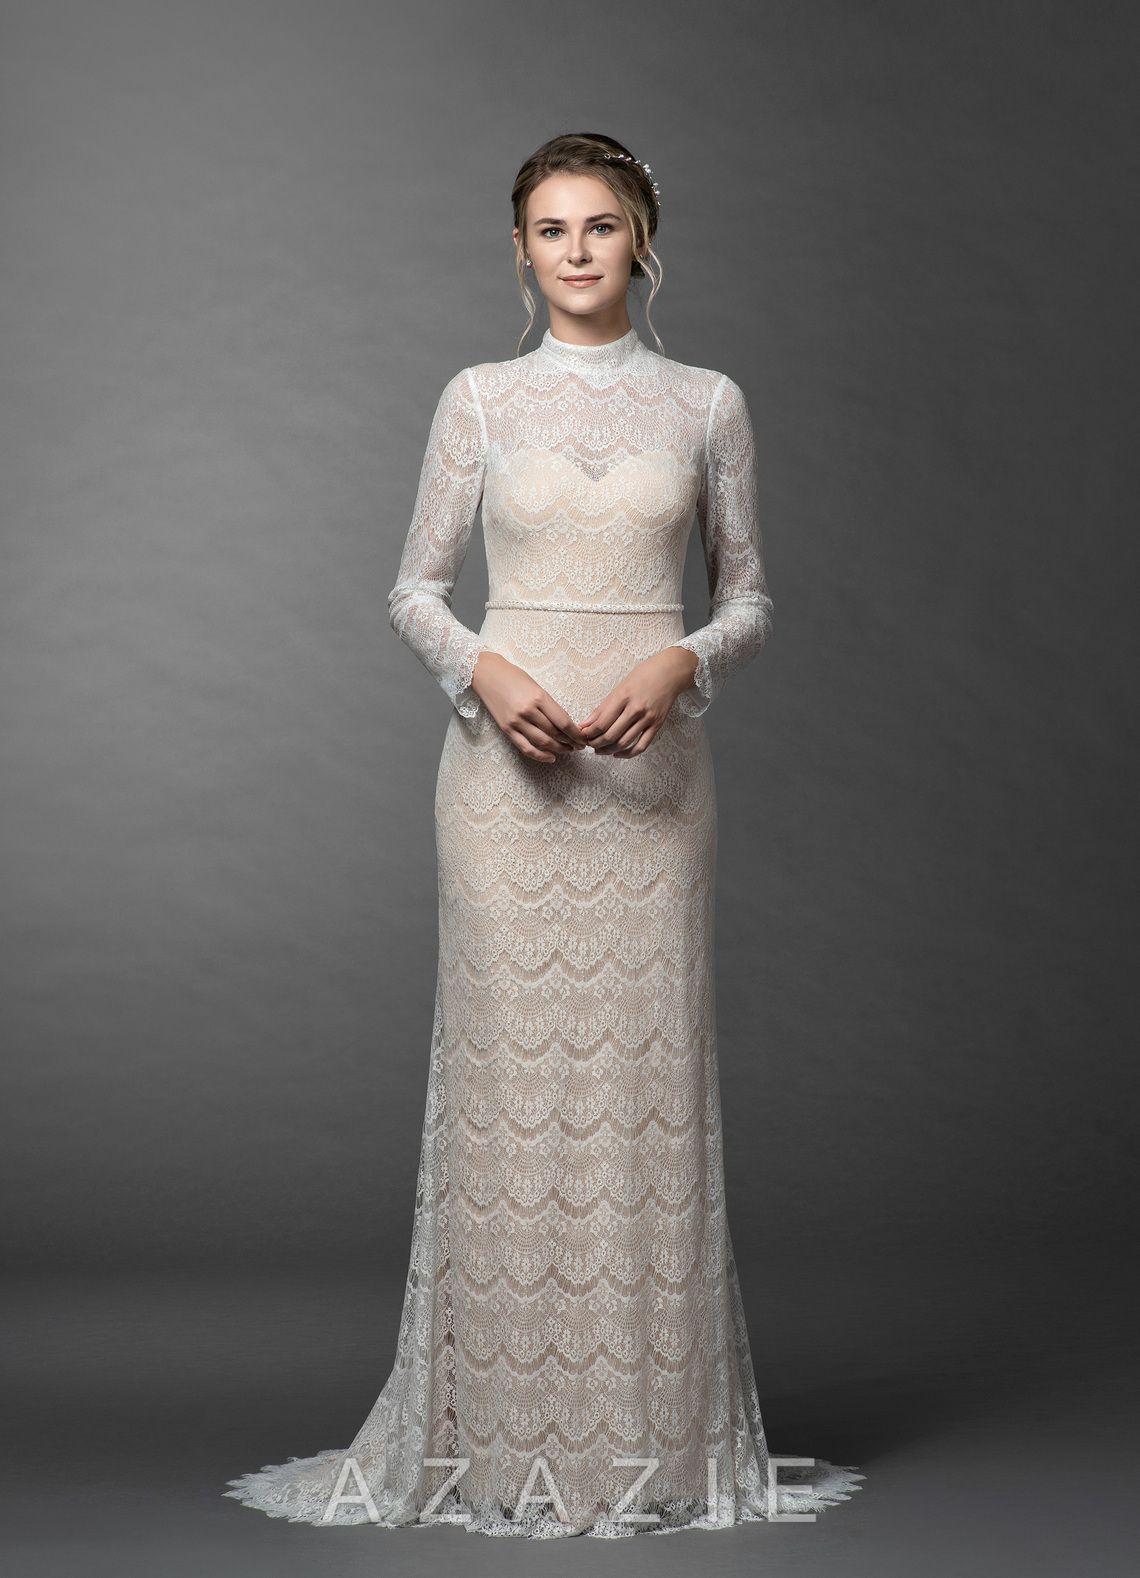 Azazie Ozette BG Wedding Dress Diamond White/Champagne